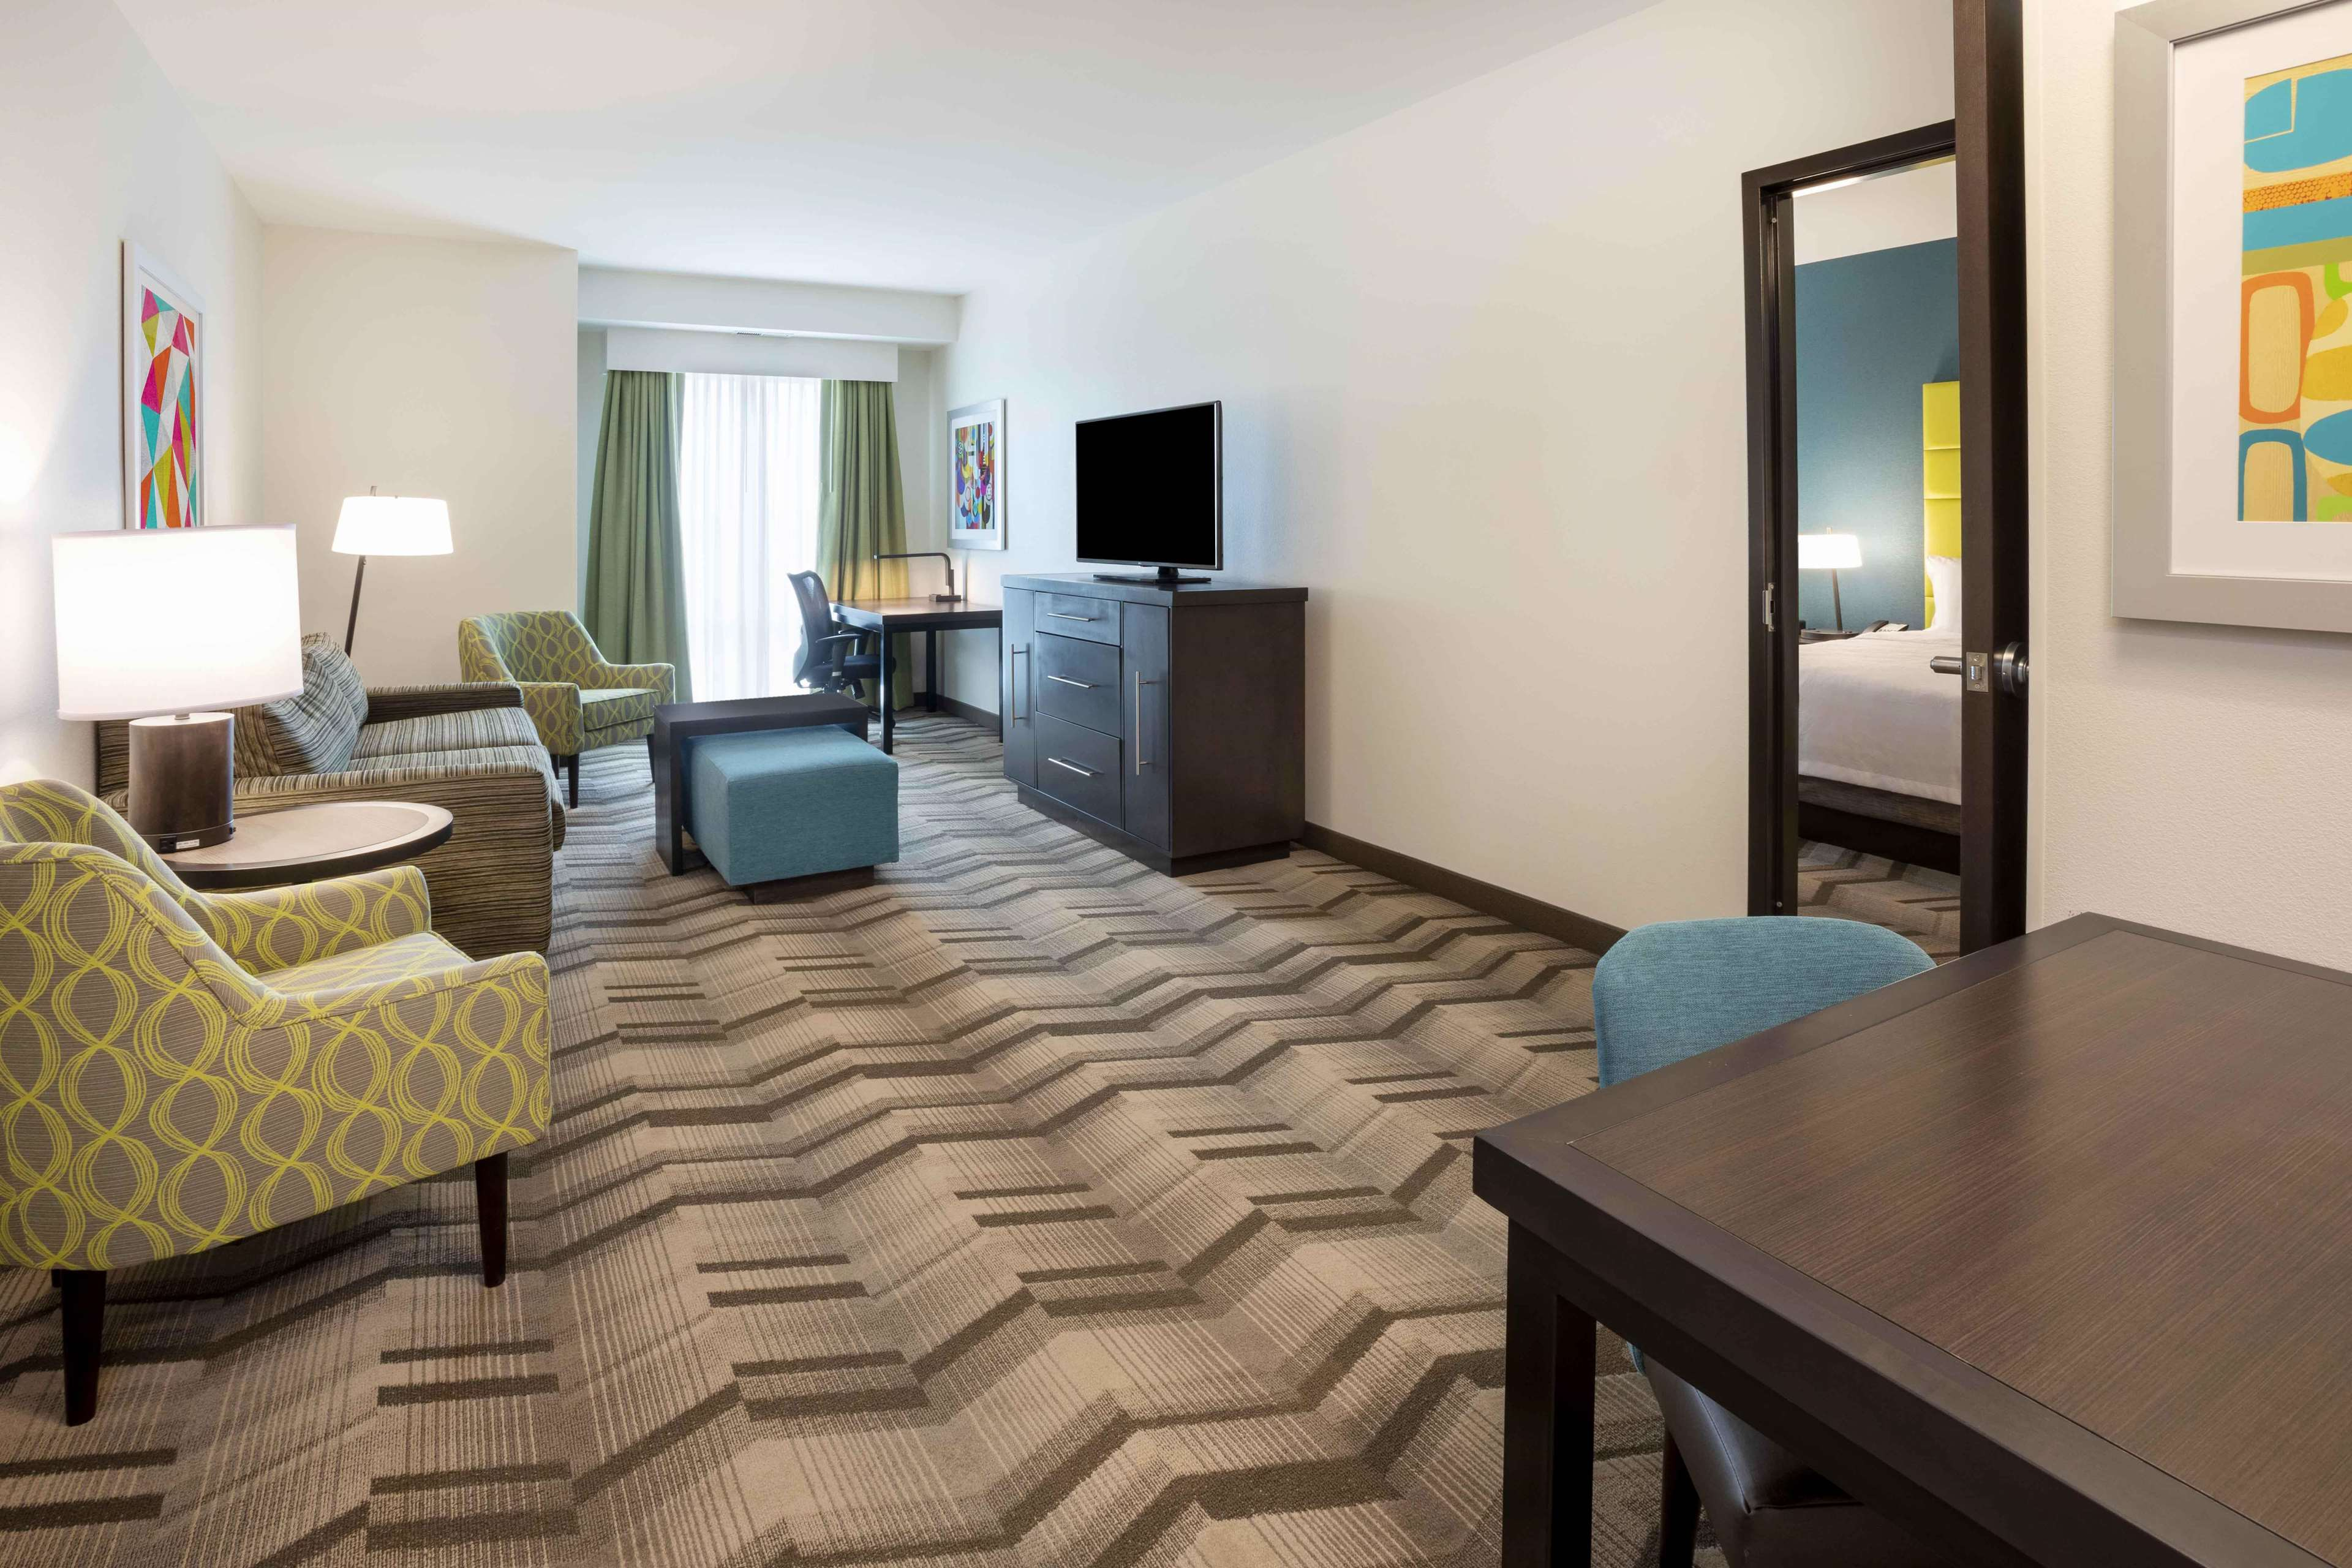 Homewood Suites by Hilton Edina Minneapolis image 30